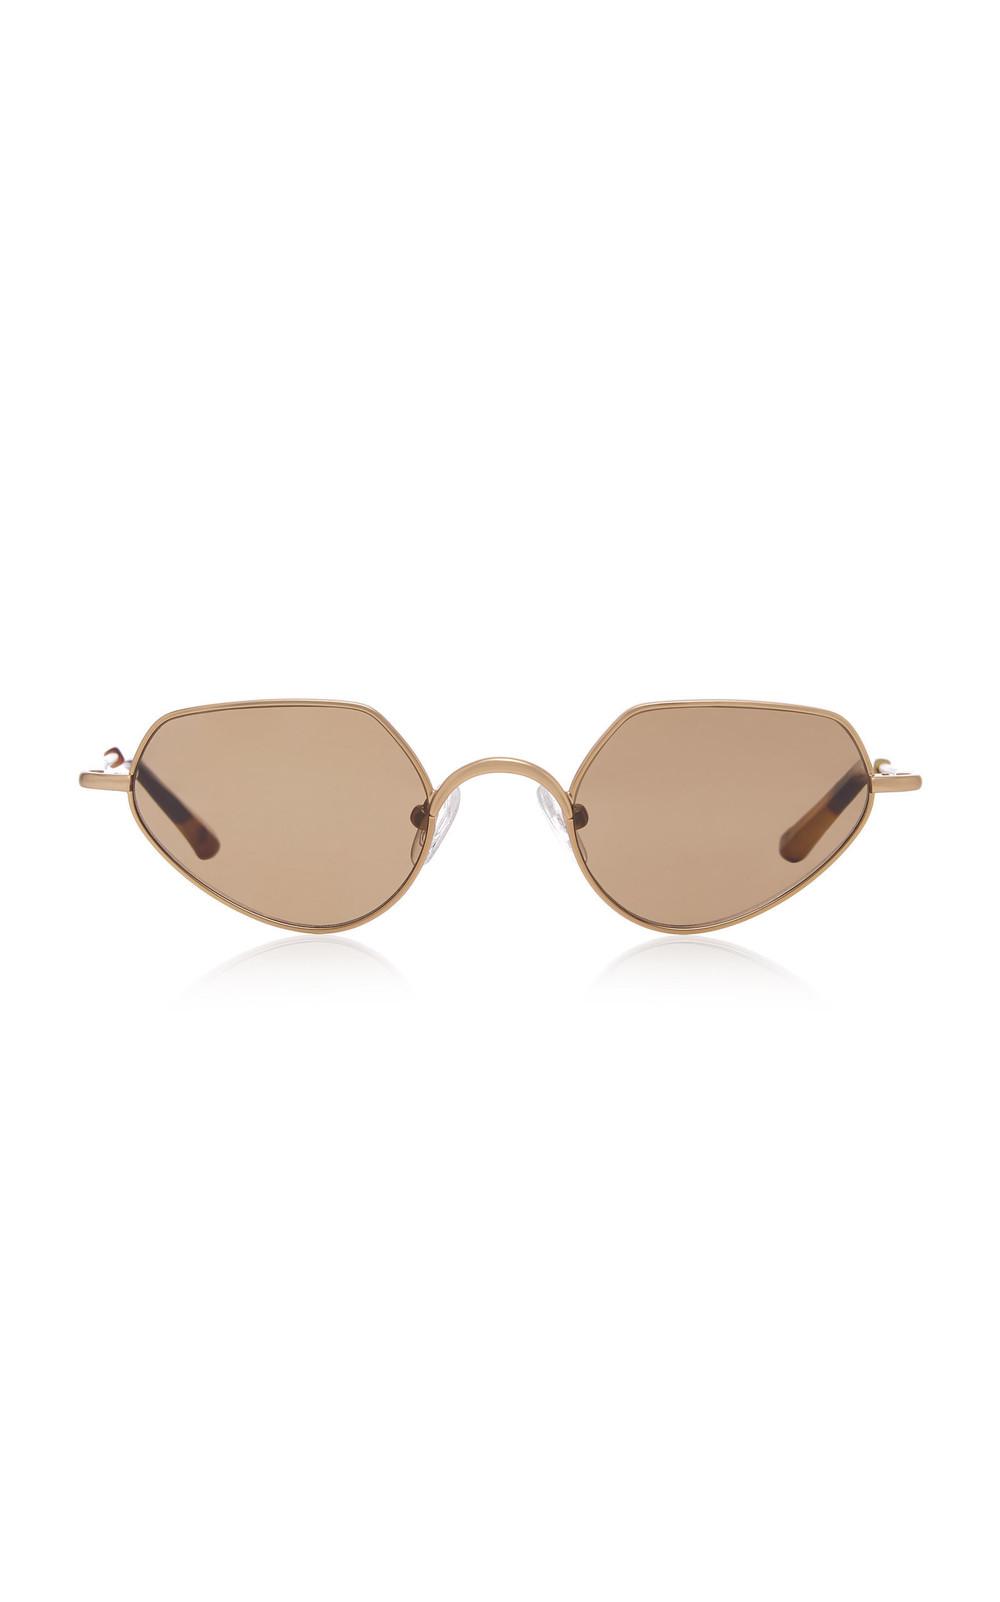 Dries Van Noten Round Stainless Steel Sunglasses in gold